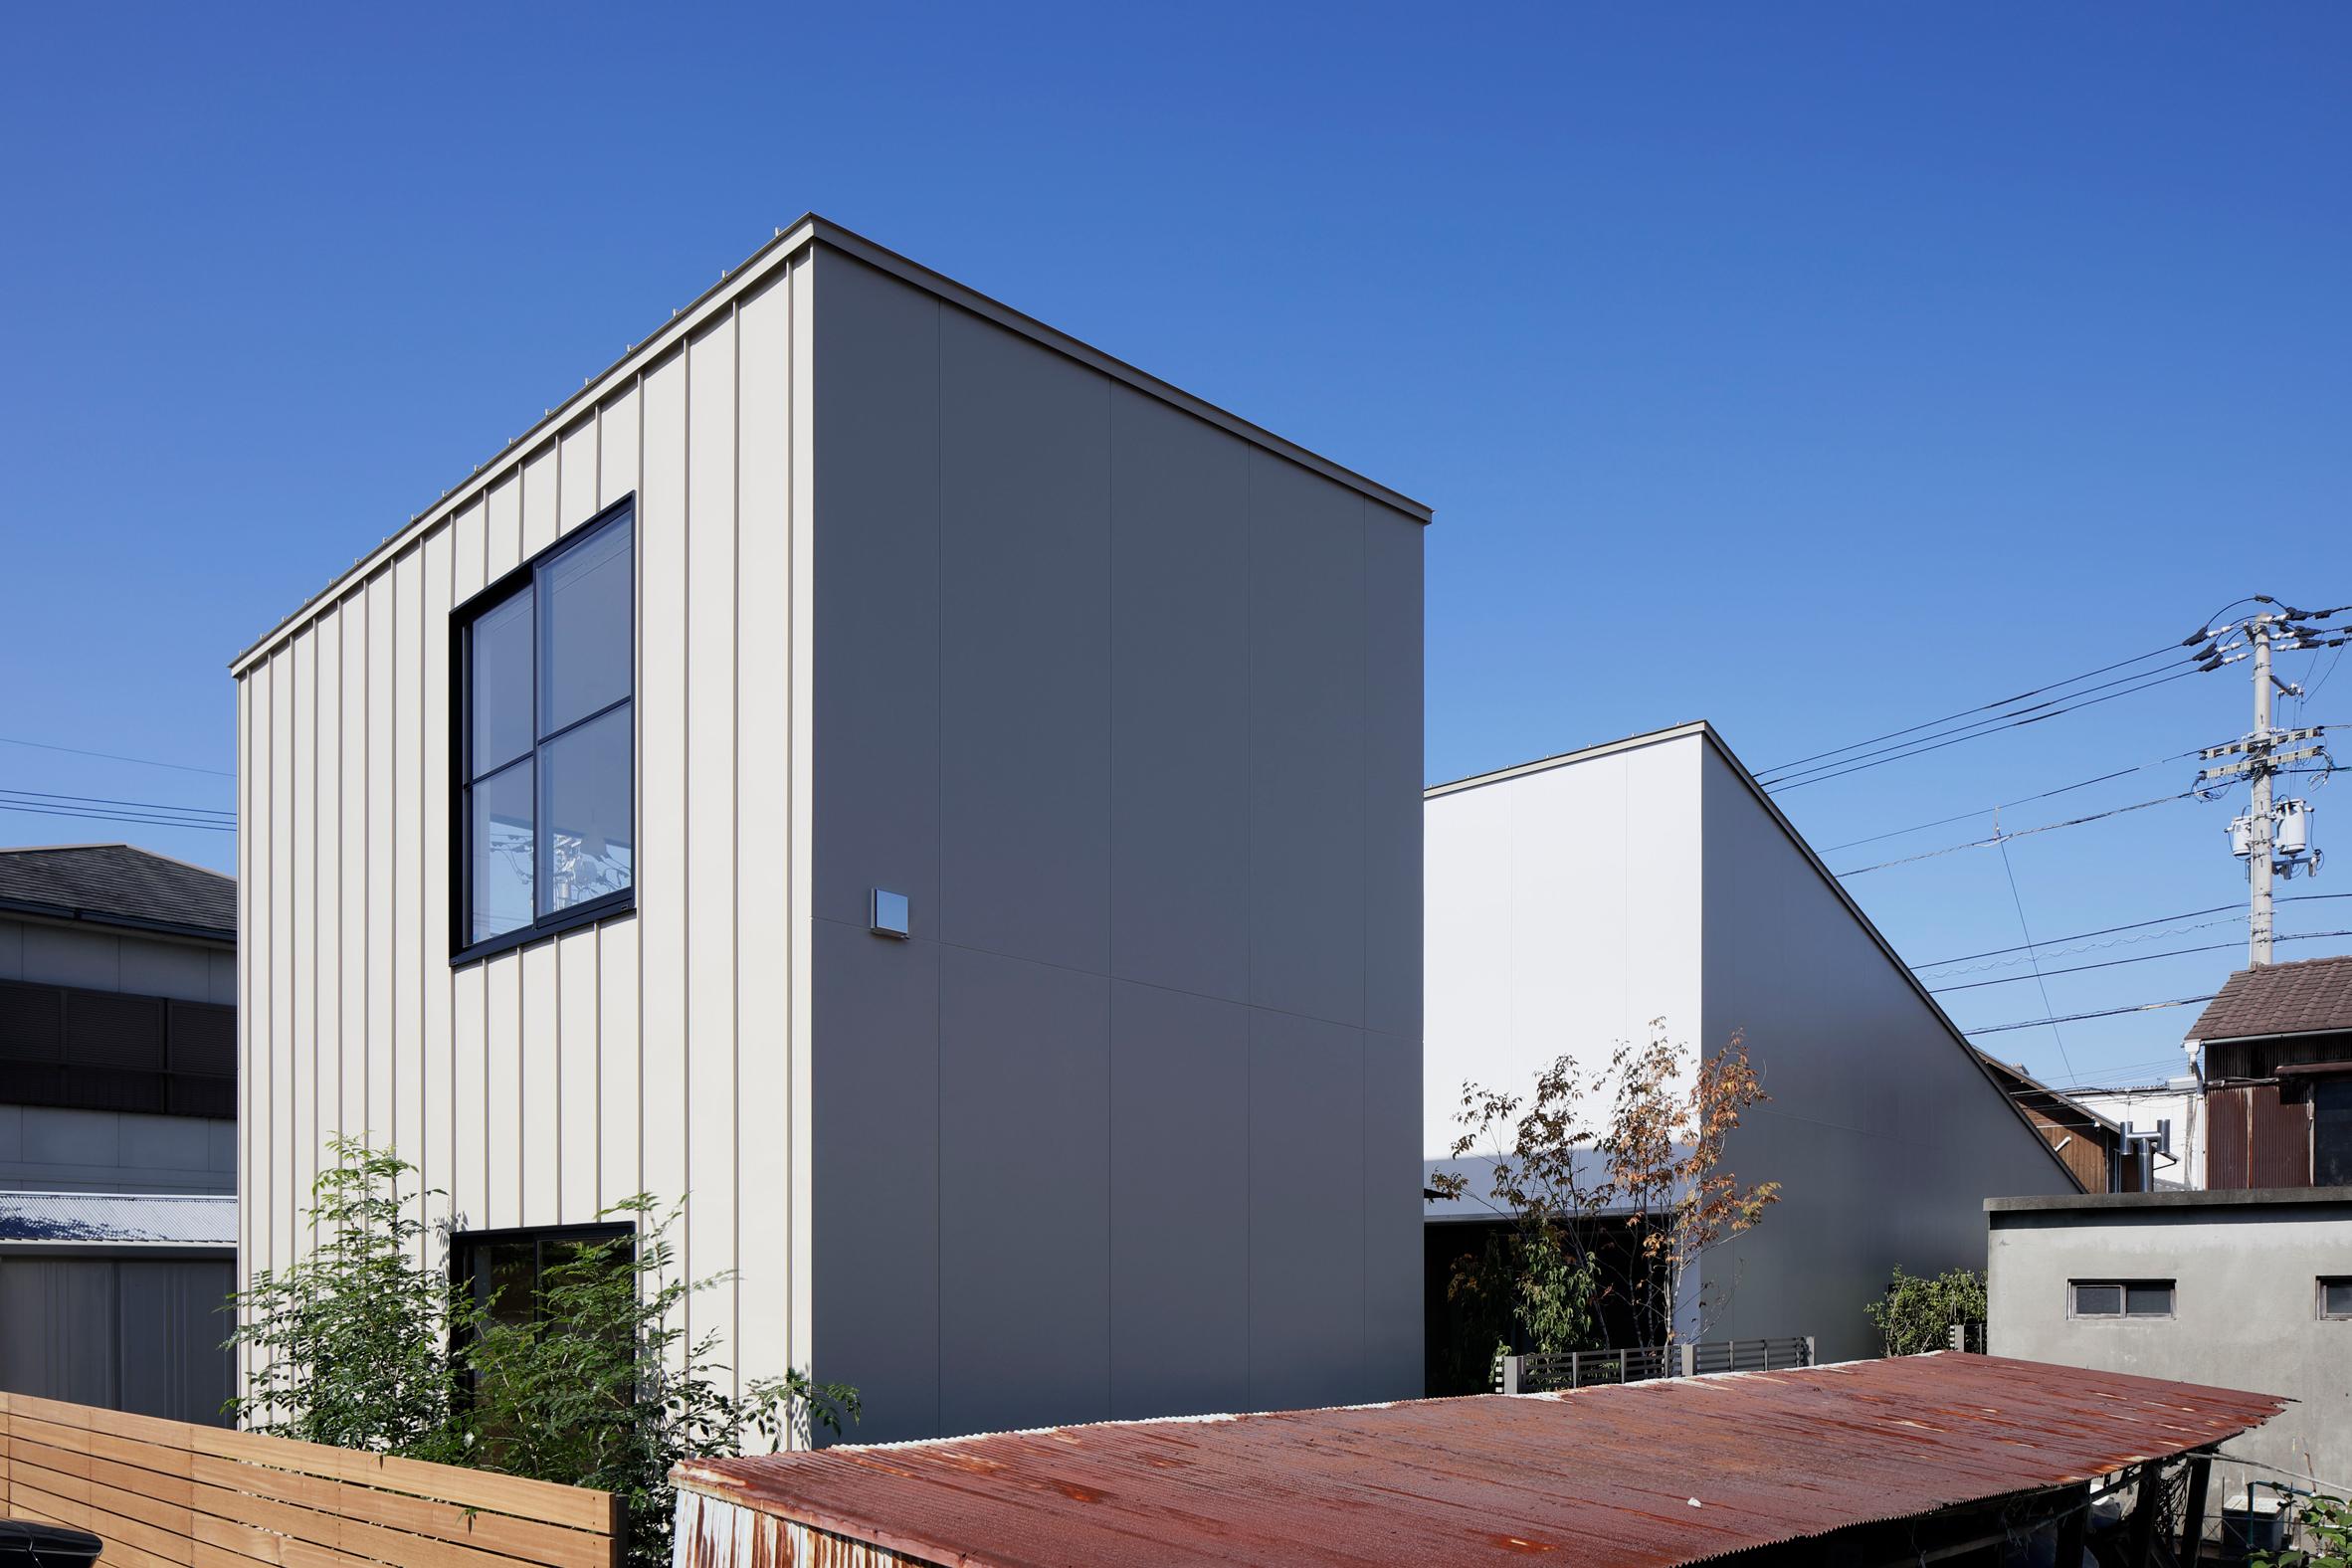 Deceptively industrial facade conceals bright contemporary home in Japan